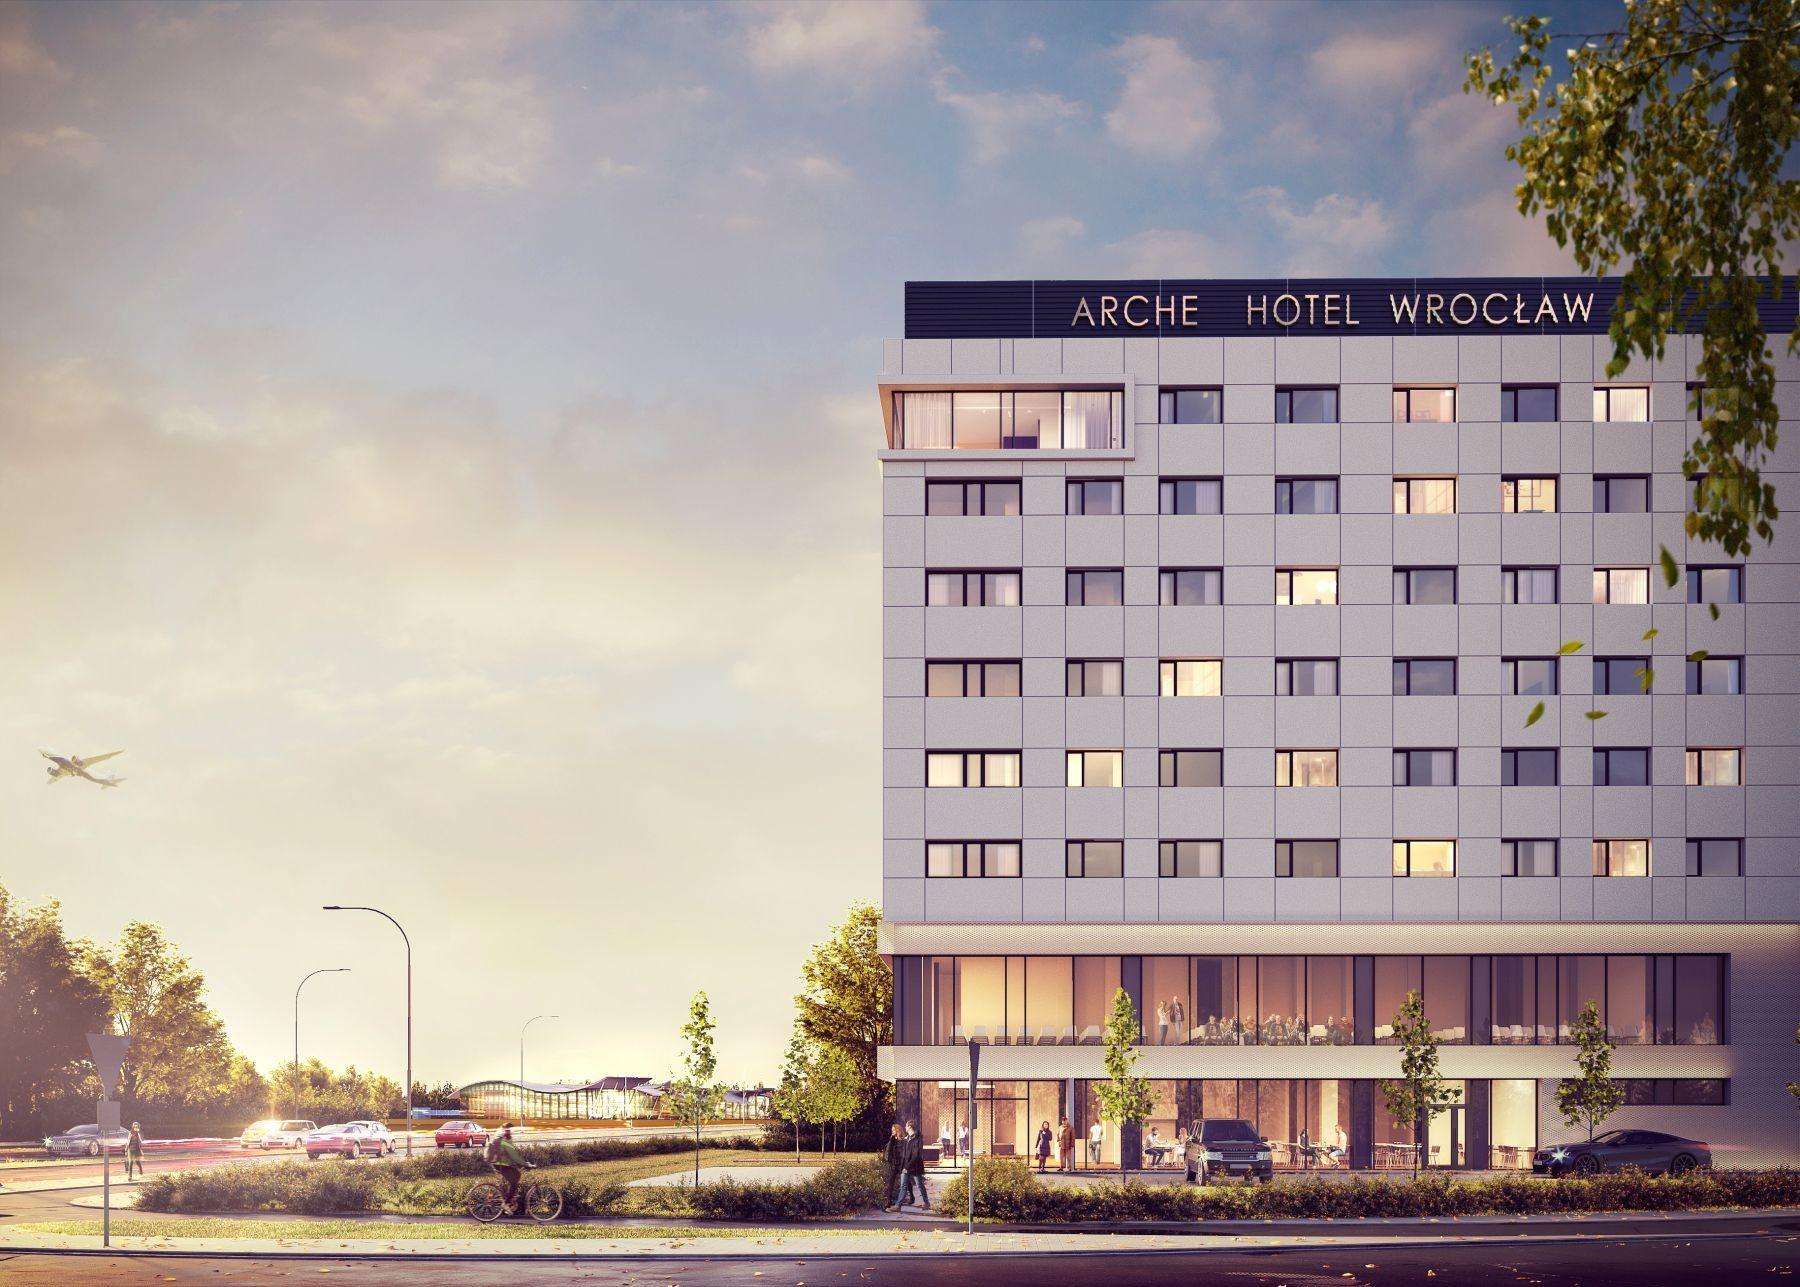 Arche Hotel Wrocław